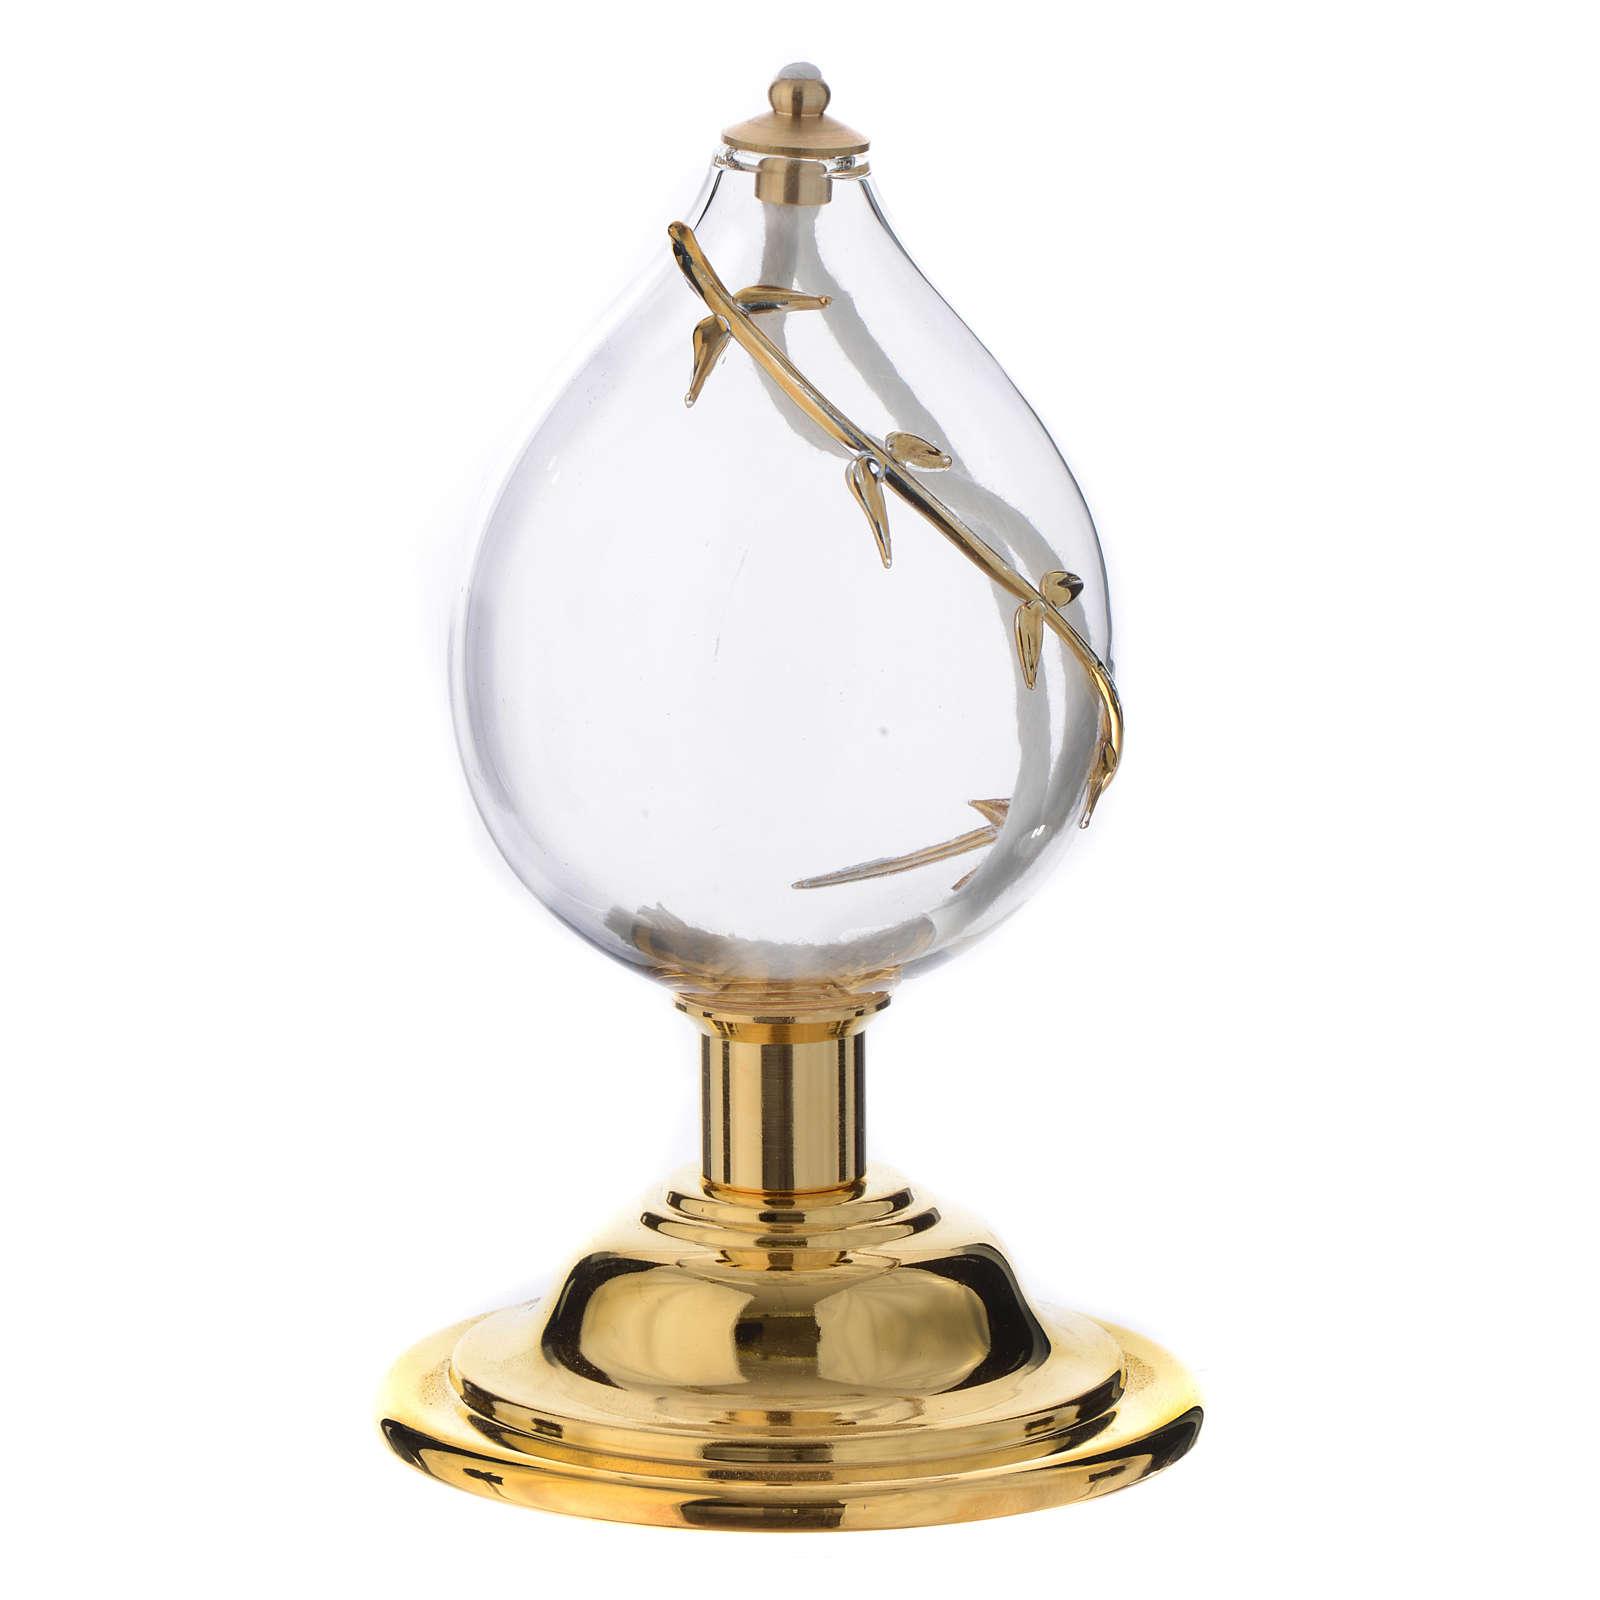 Lamparina gota cristal soprado decoro dourado 3